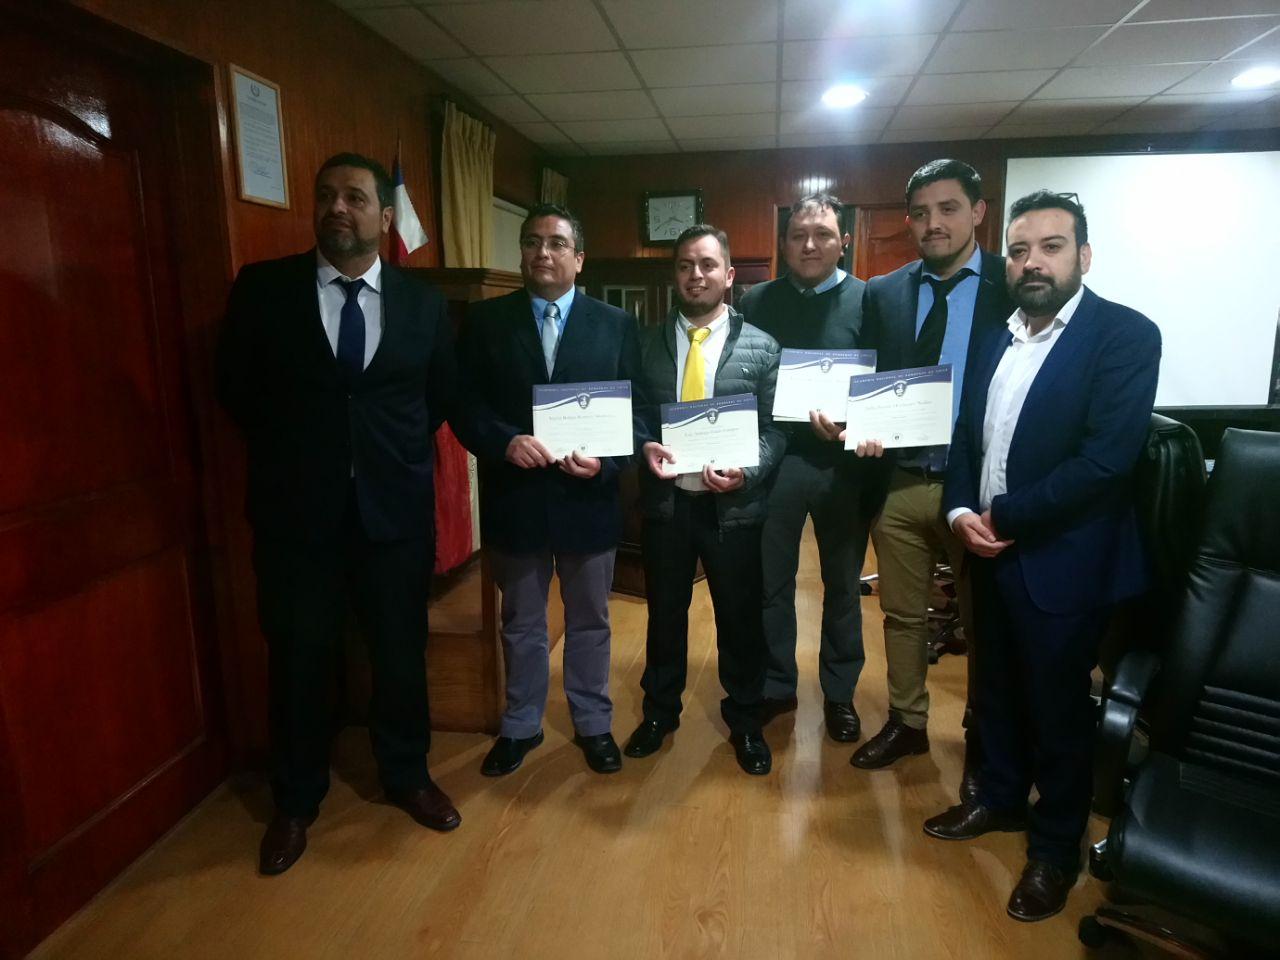 Entrega diplomas Bomberos Profesionales